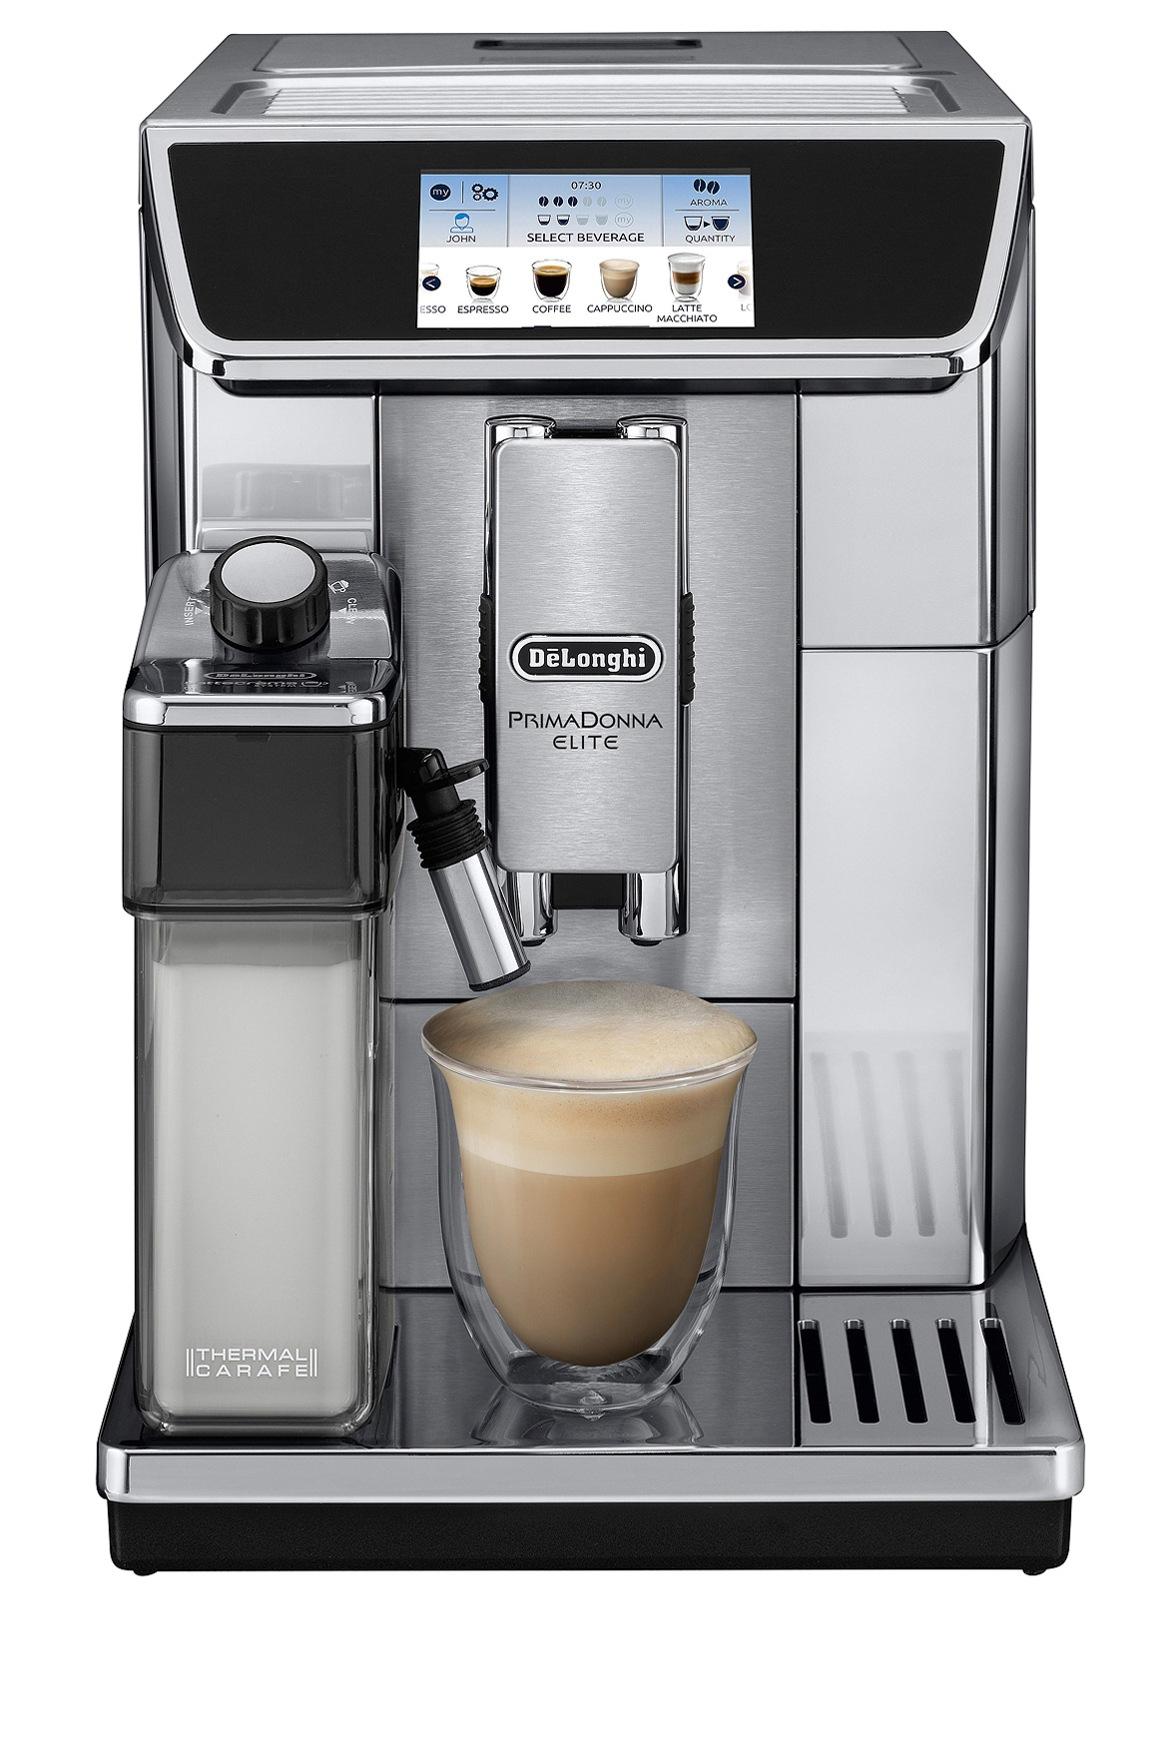 Uncategorized Myer Kitchen Appliances delonghi ecam65075ms primadonna elite touch coffee machine myer online